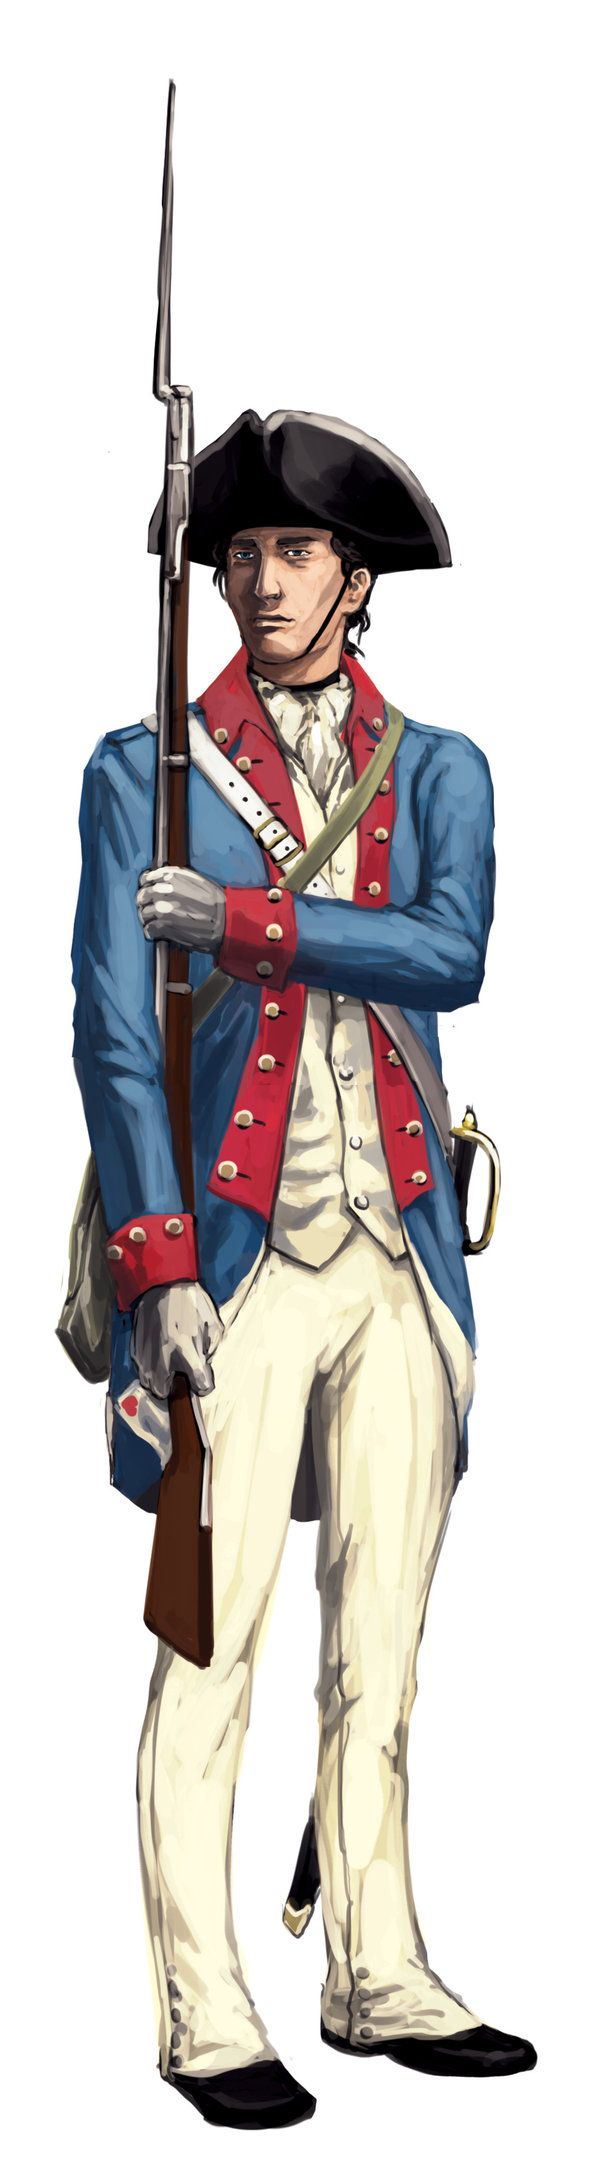 Continental Soldier, American Revolution by Daldbaatar.deviantart.com on @deviantART